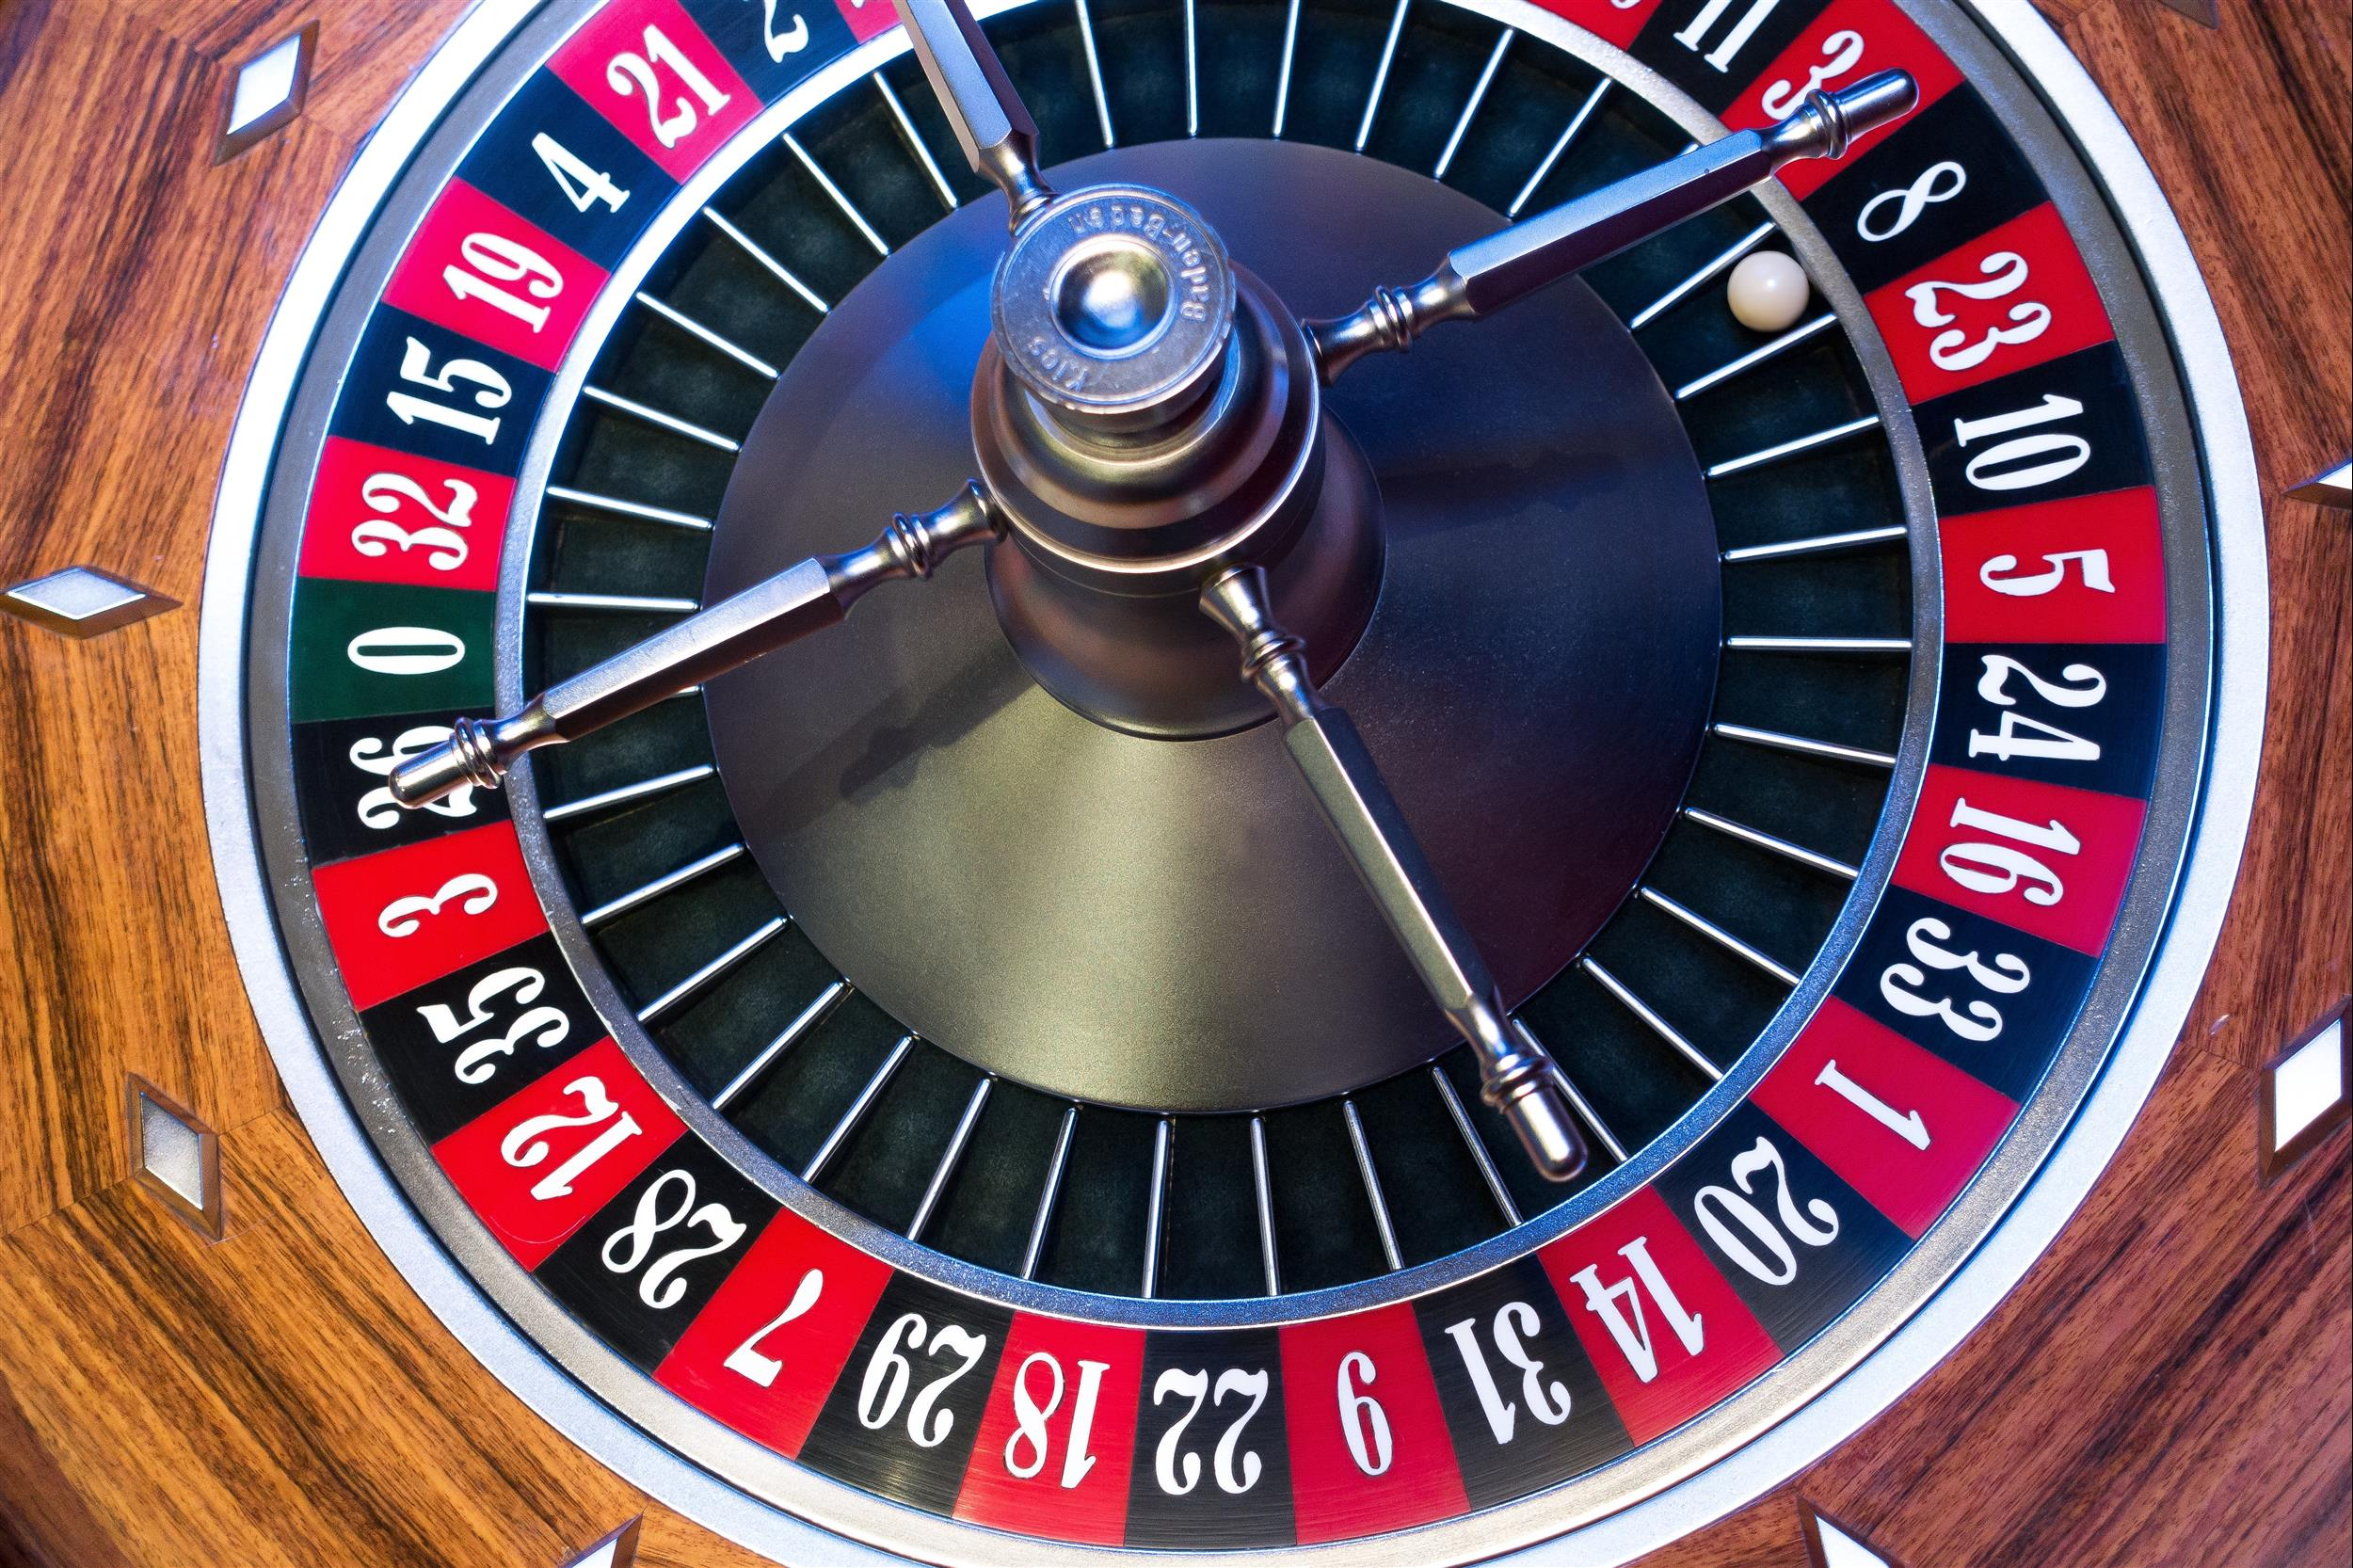 Kootenai Casino